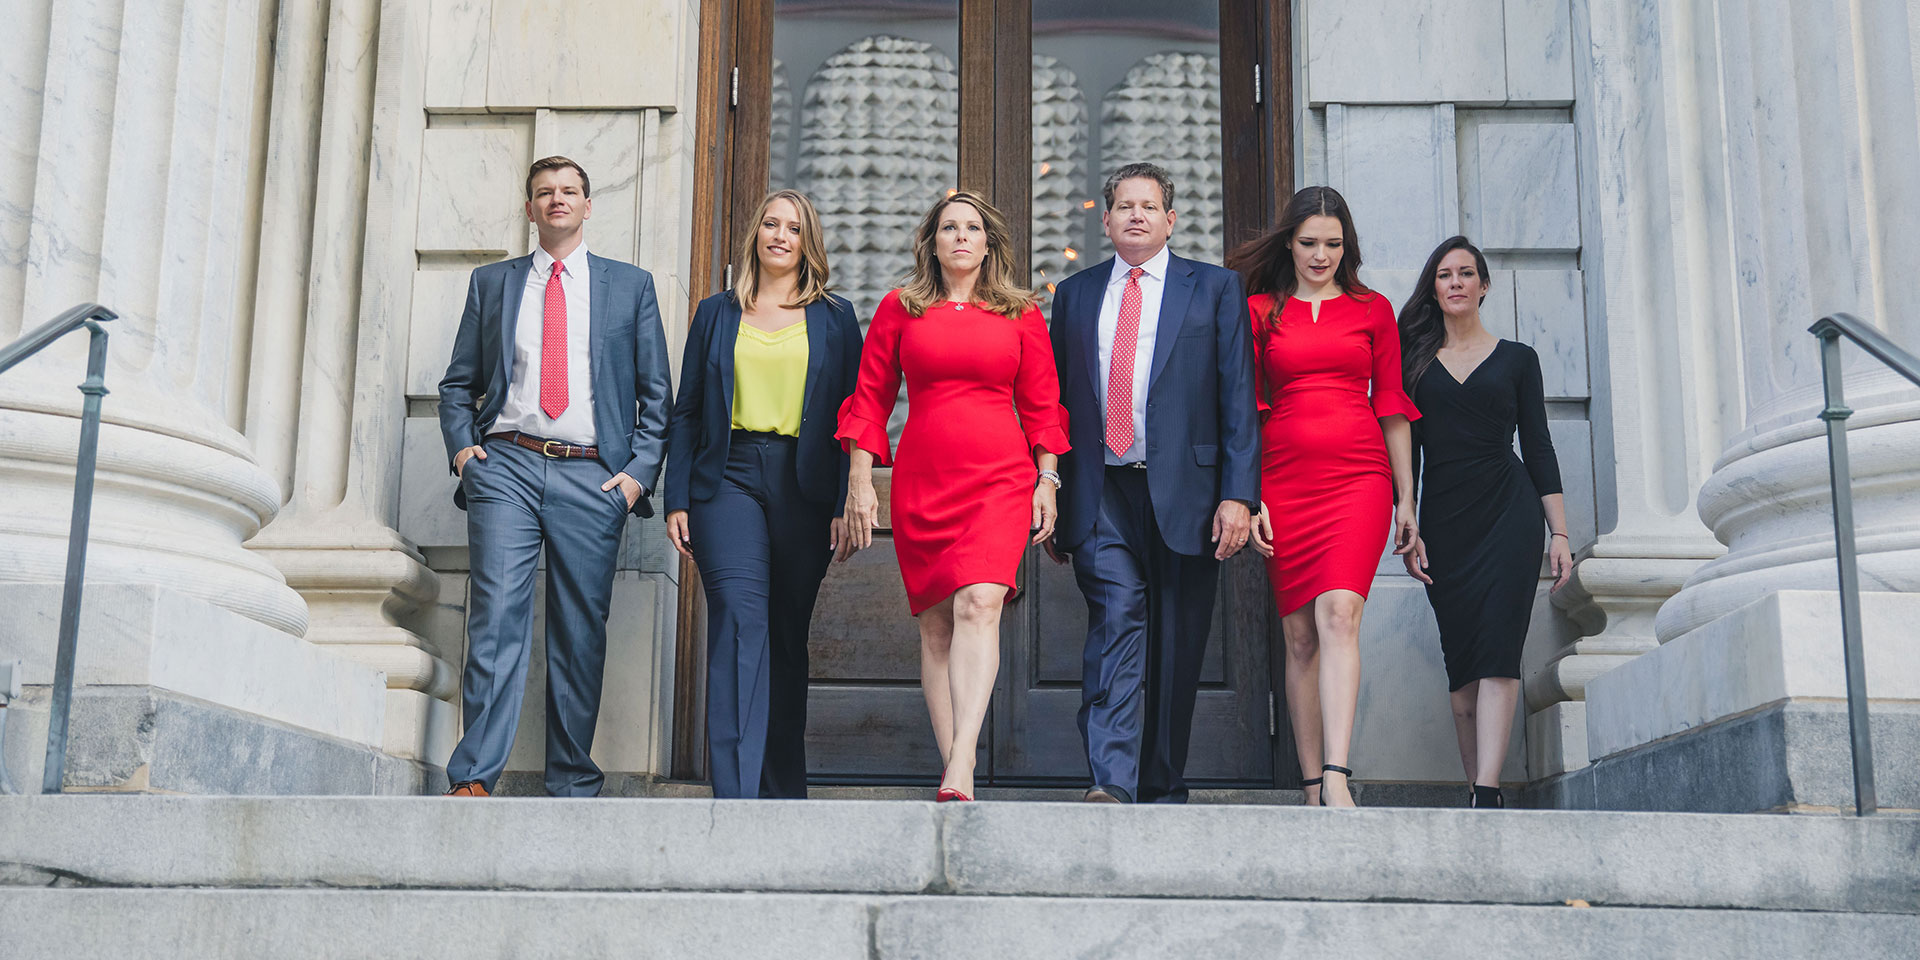 Rosenberg Law, P.A. staff photo